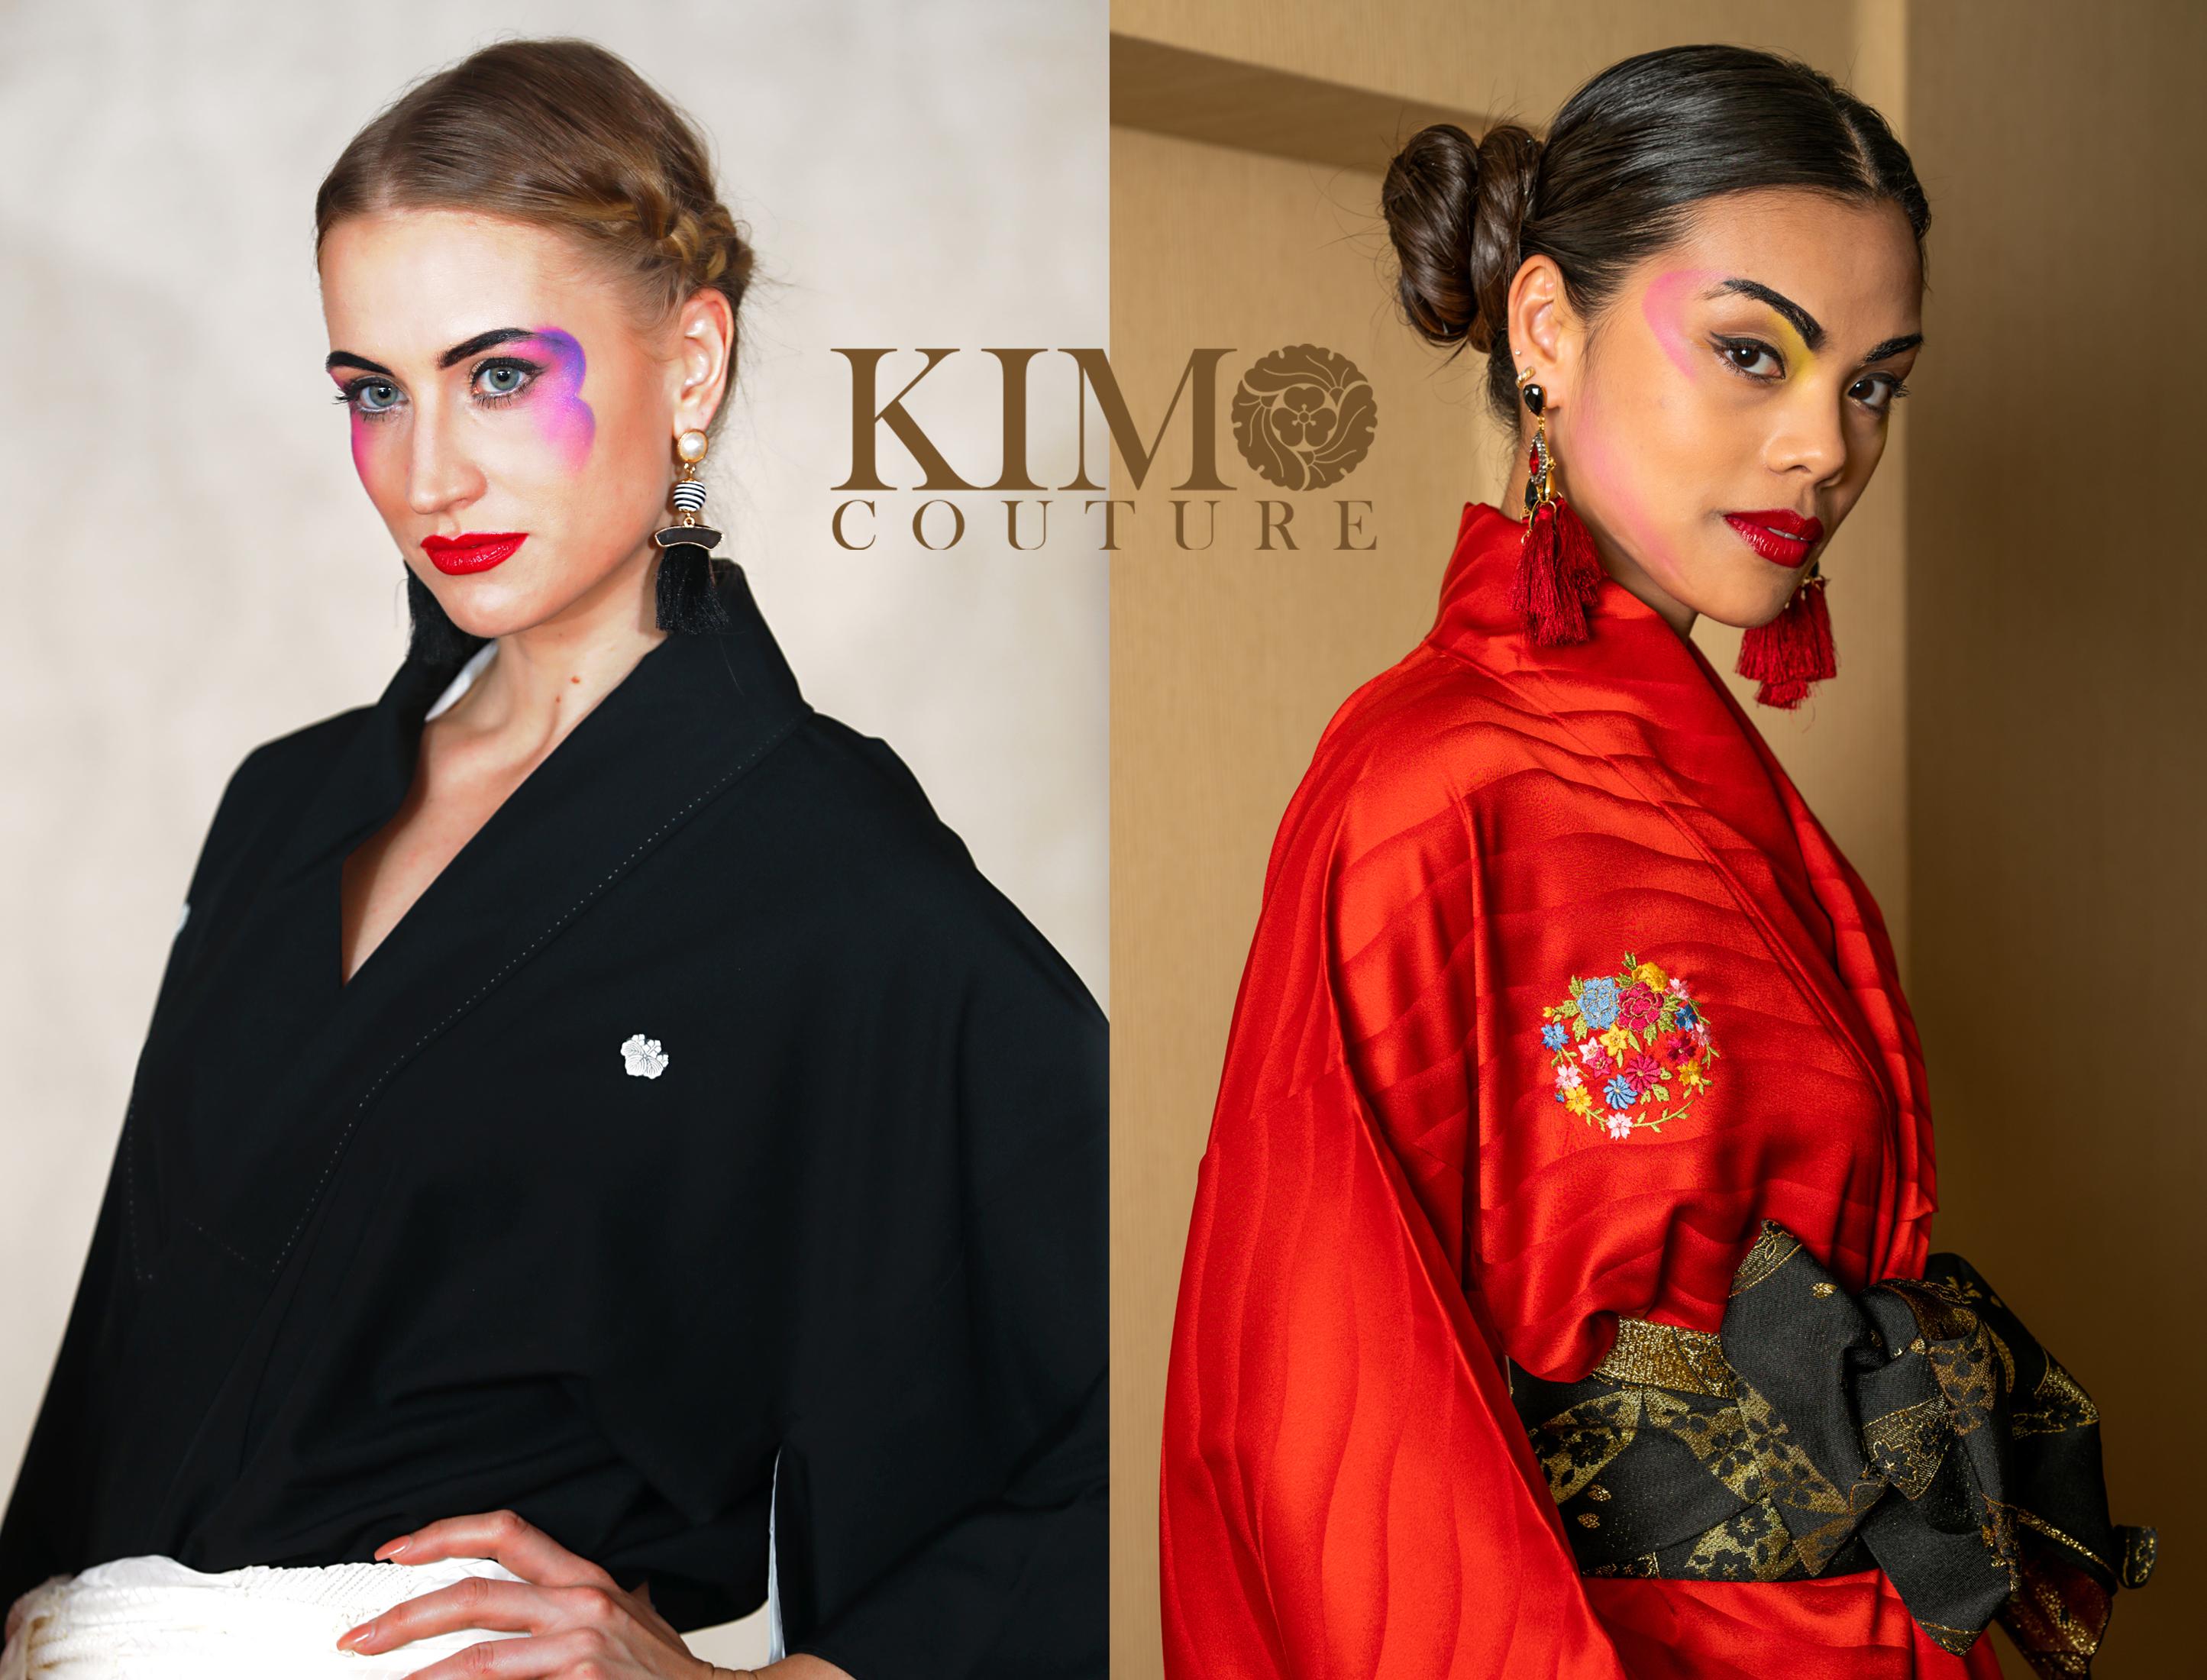 KIMO COUTURE